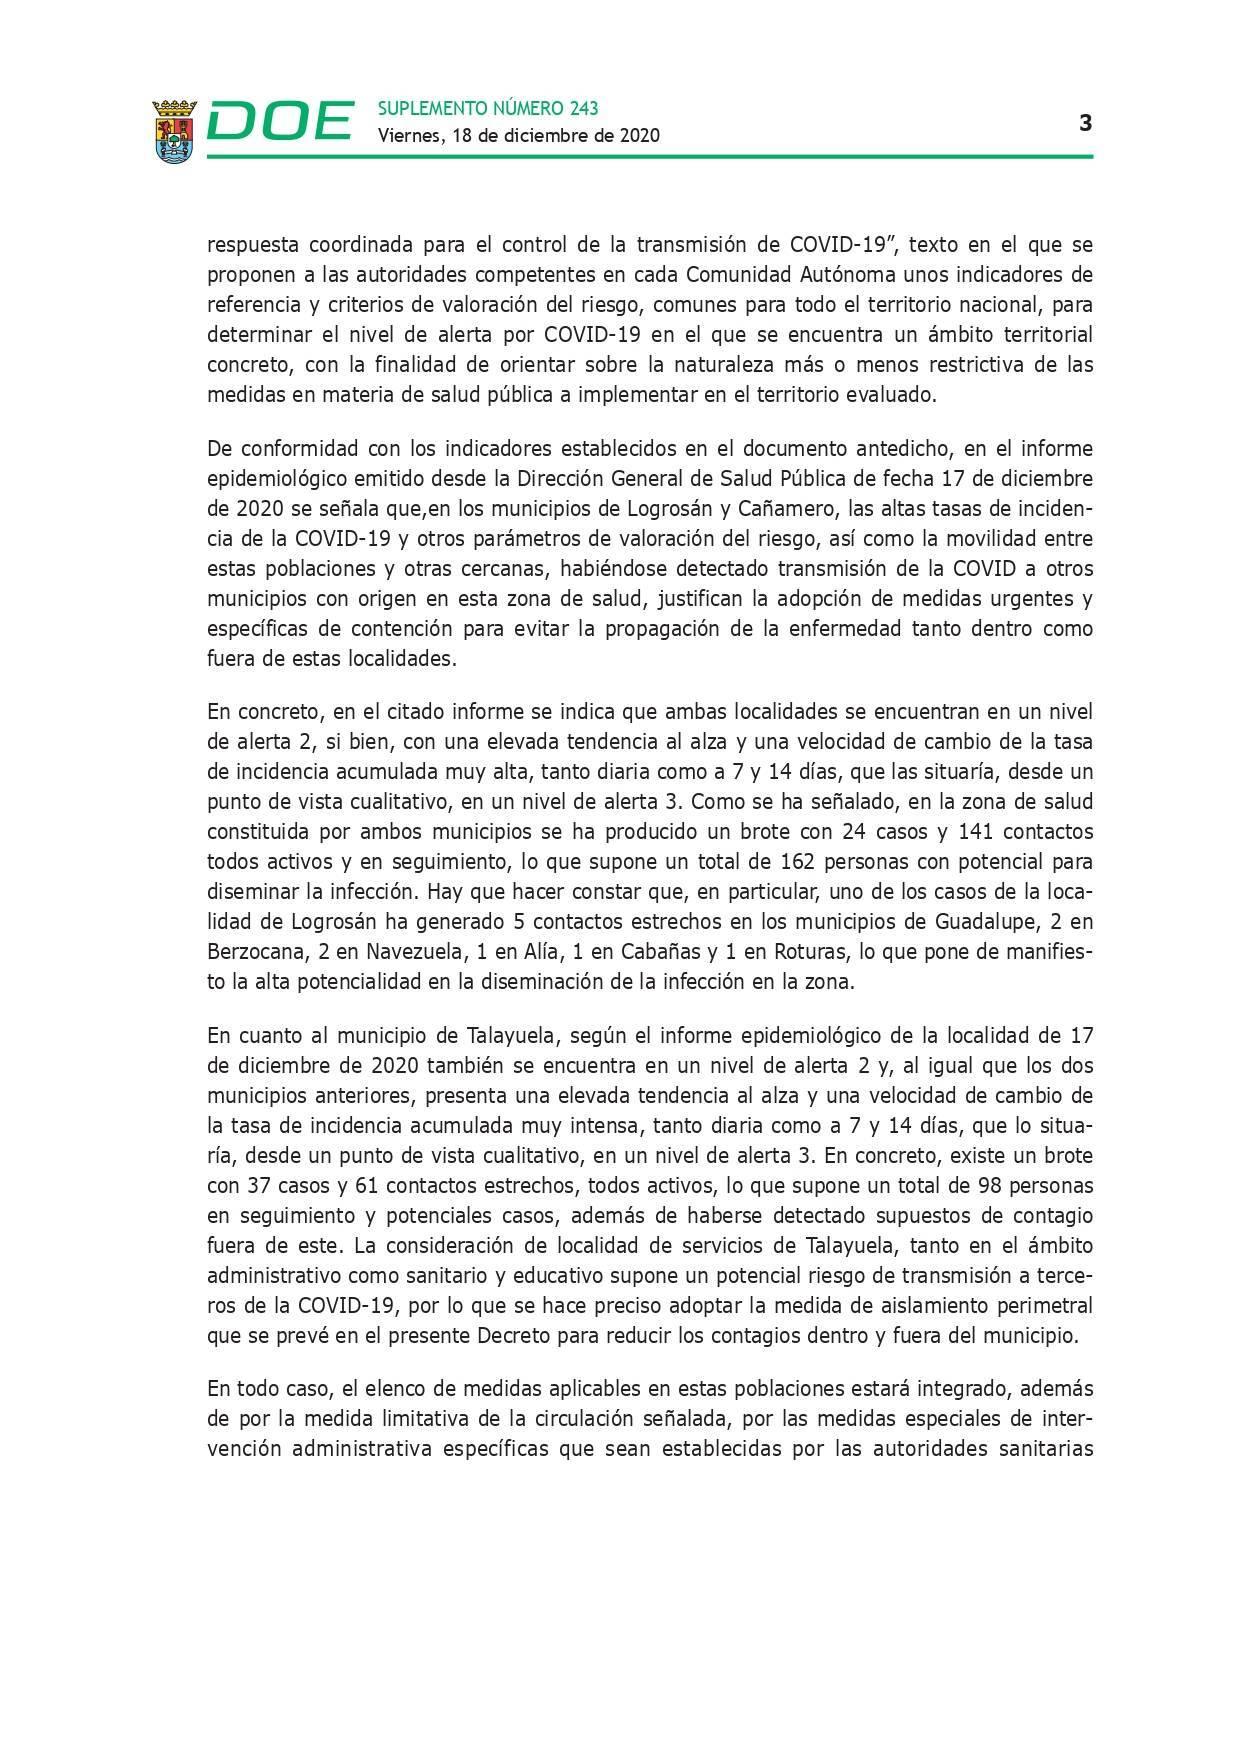 Cierre perimetral por COVID-19 (2020) - Talayuela (Cáceres), Logrosán (Cáceres) y Cañamero (Cáceres) 3